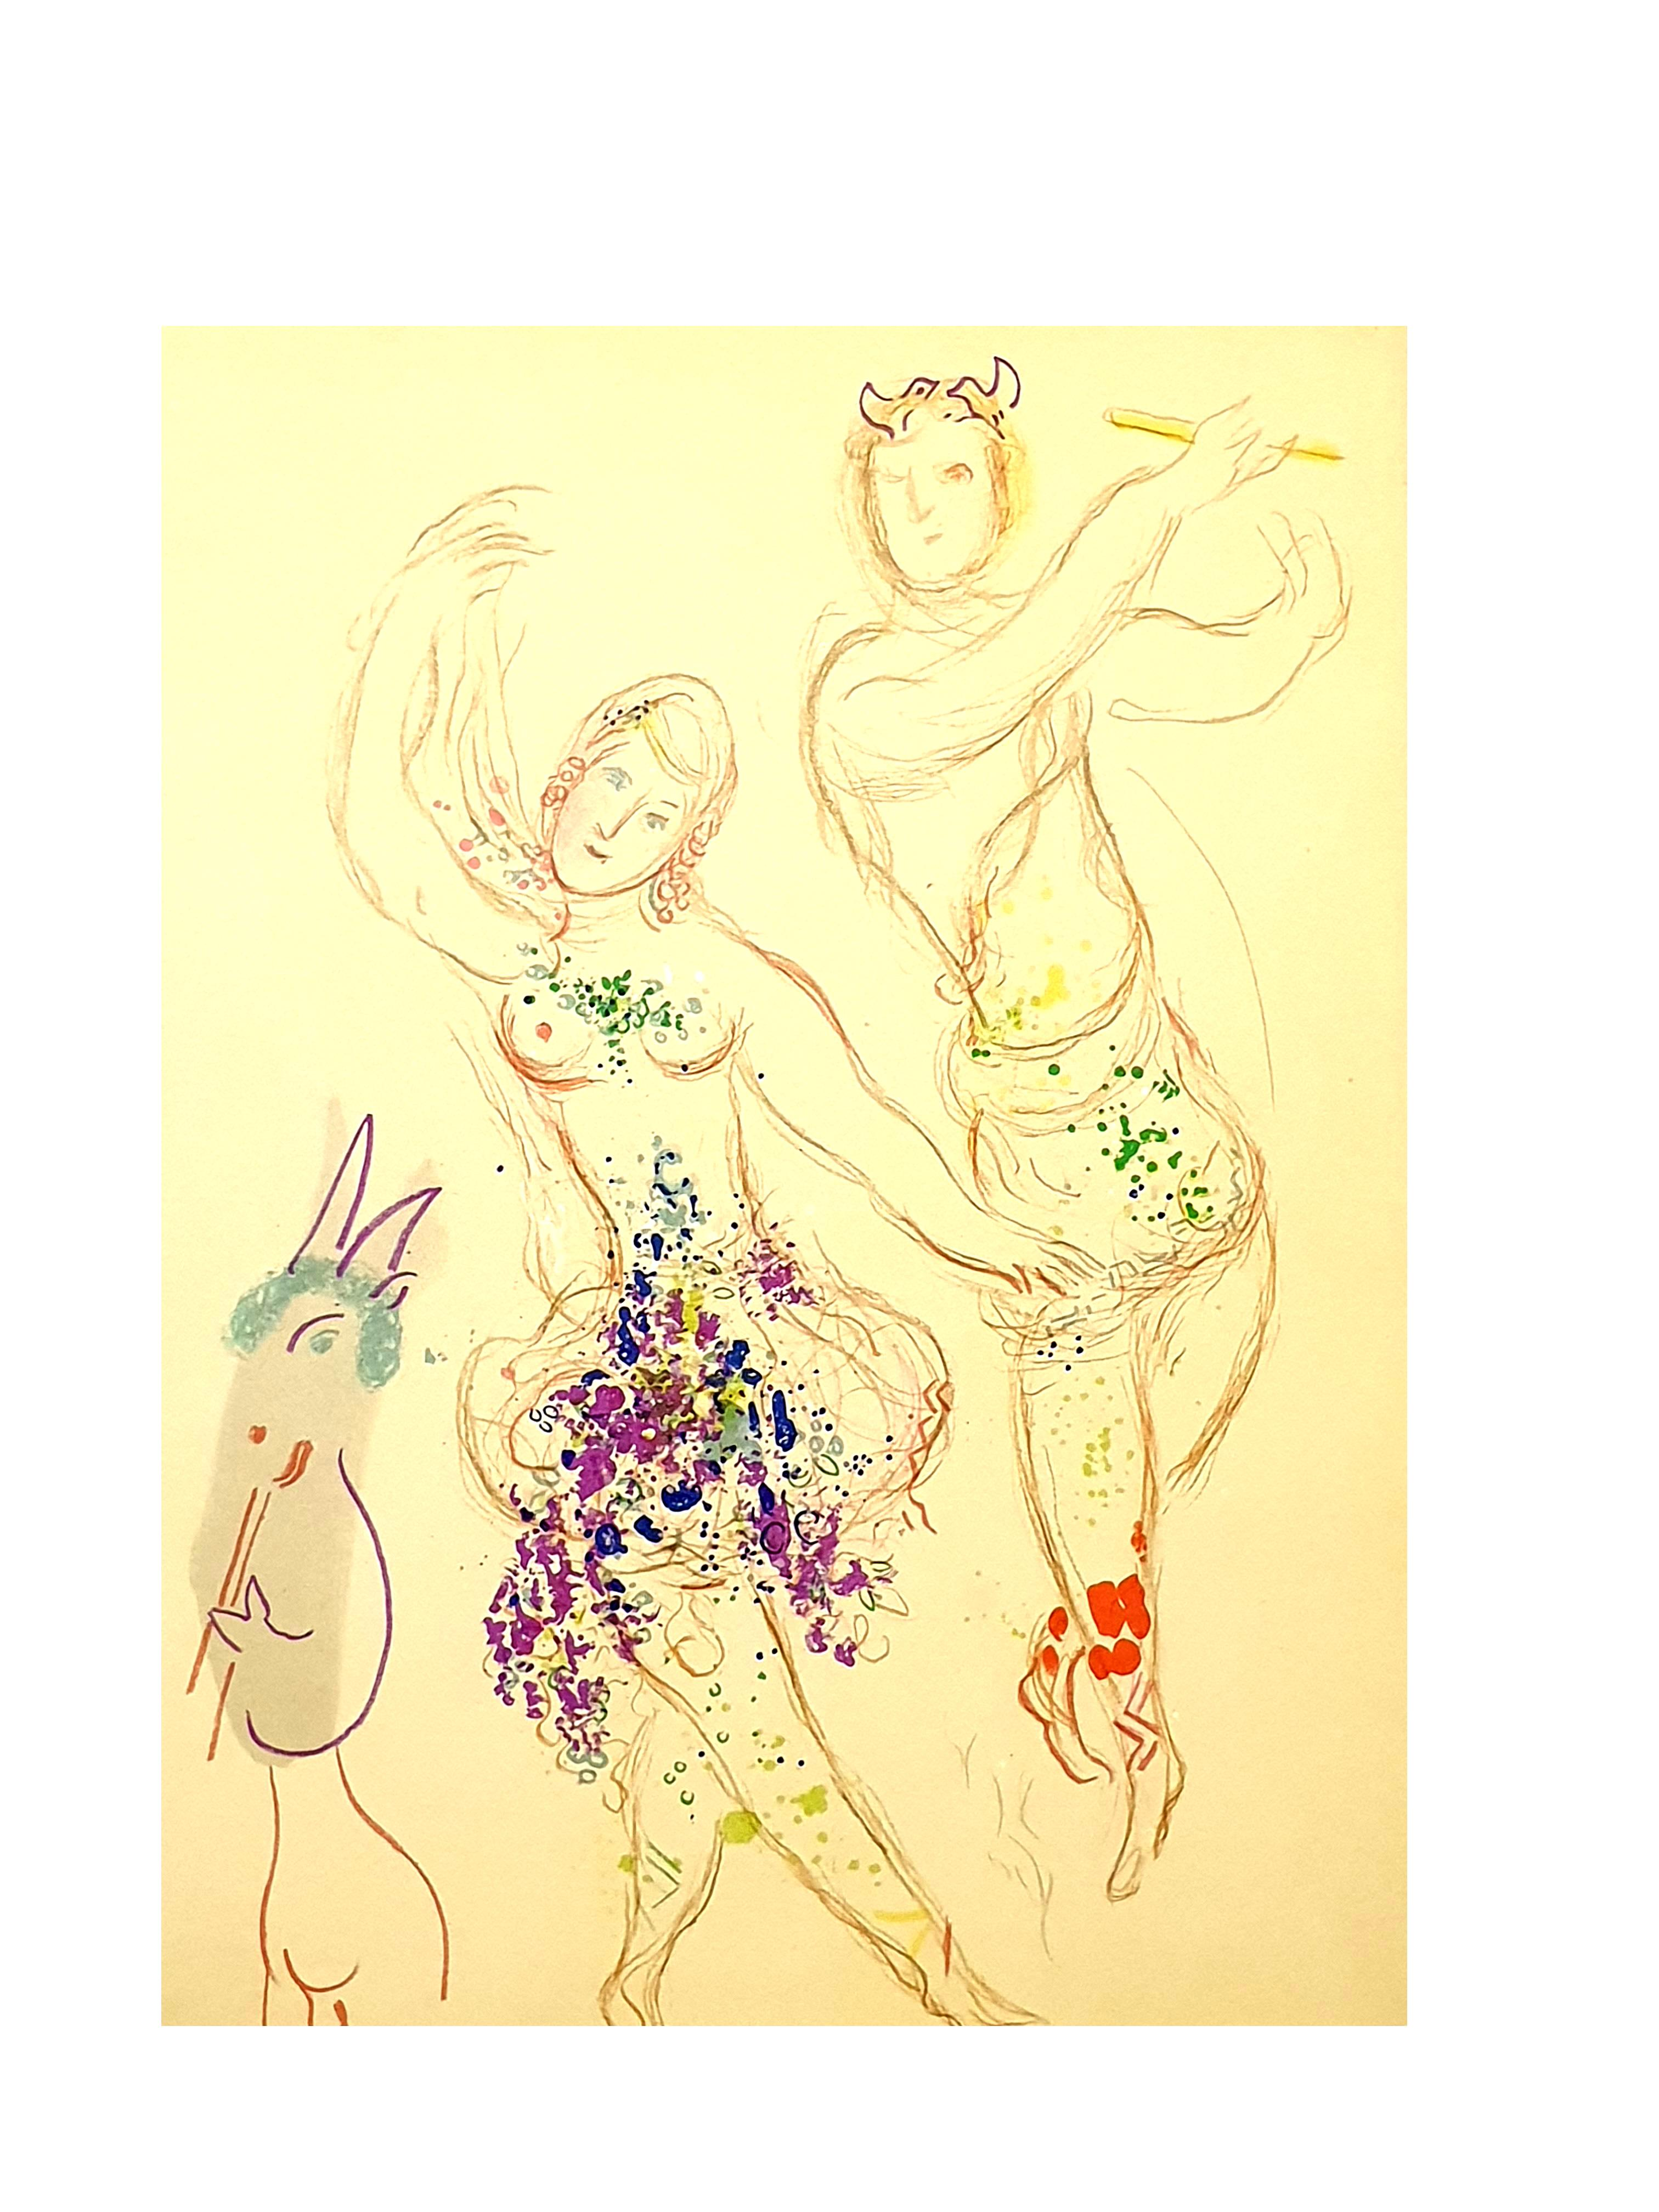 Marc Chagall - Daphnis and Chloé - Original Lithograph